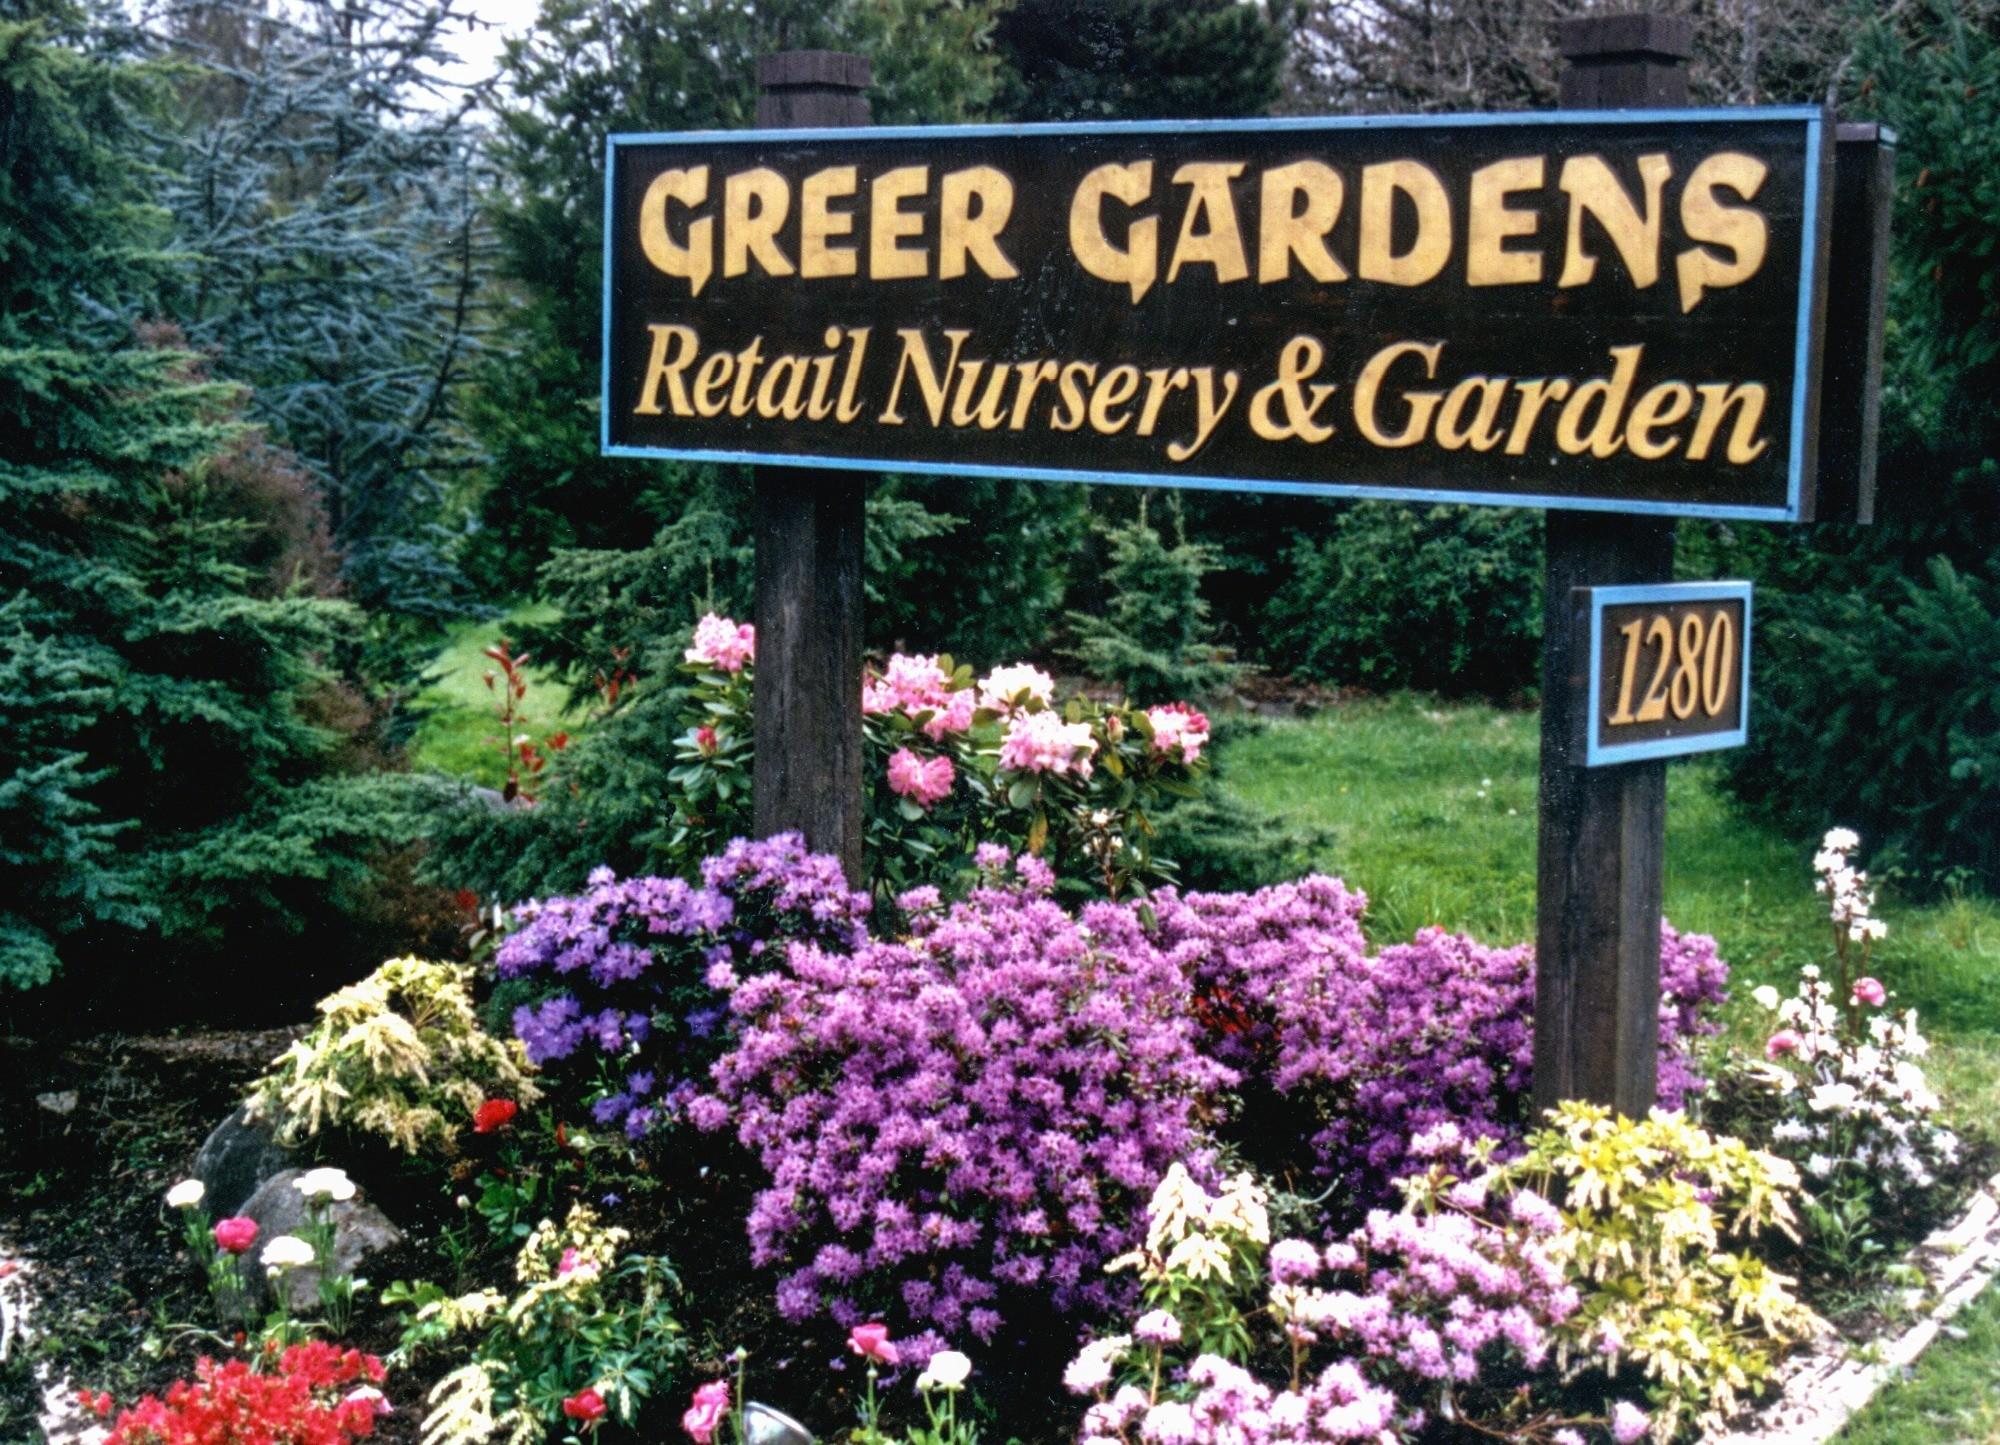 Greer Gardens Nursery